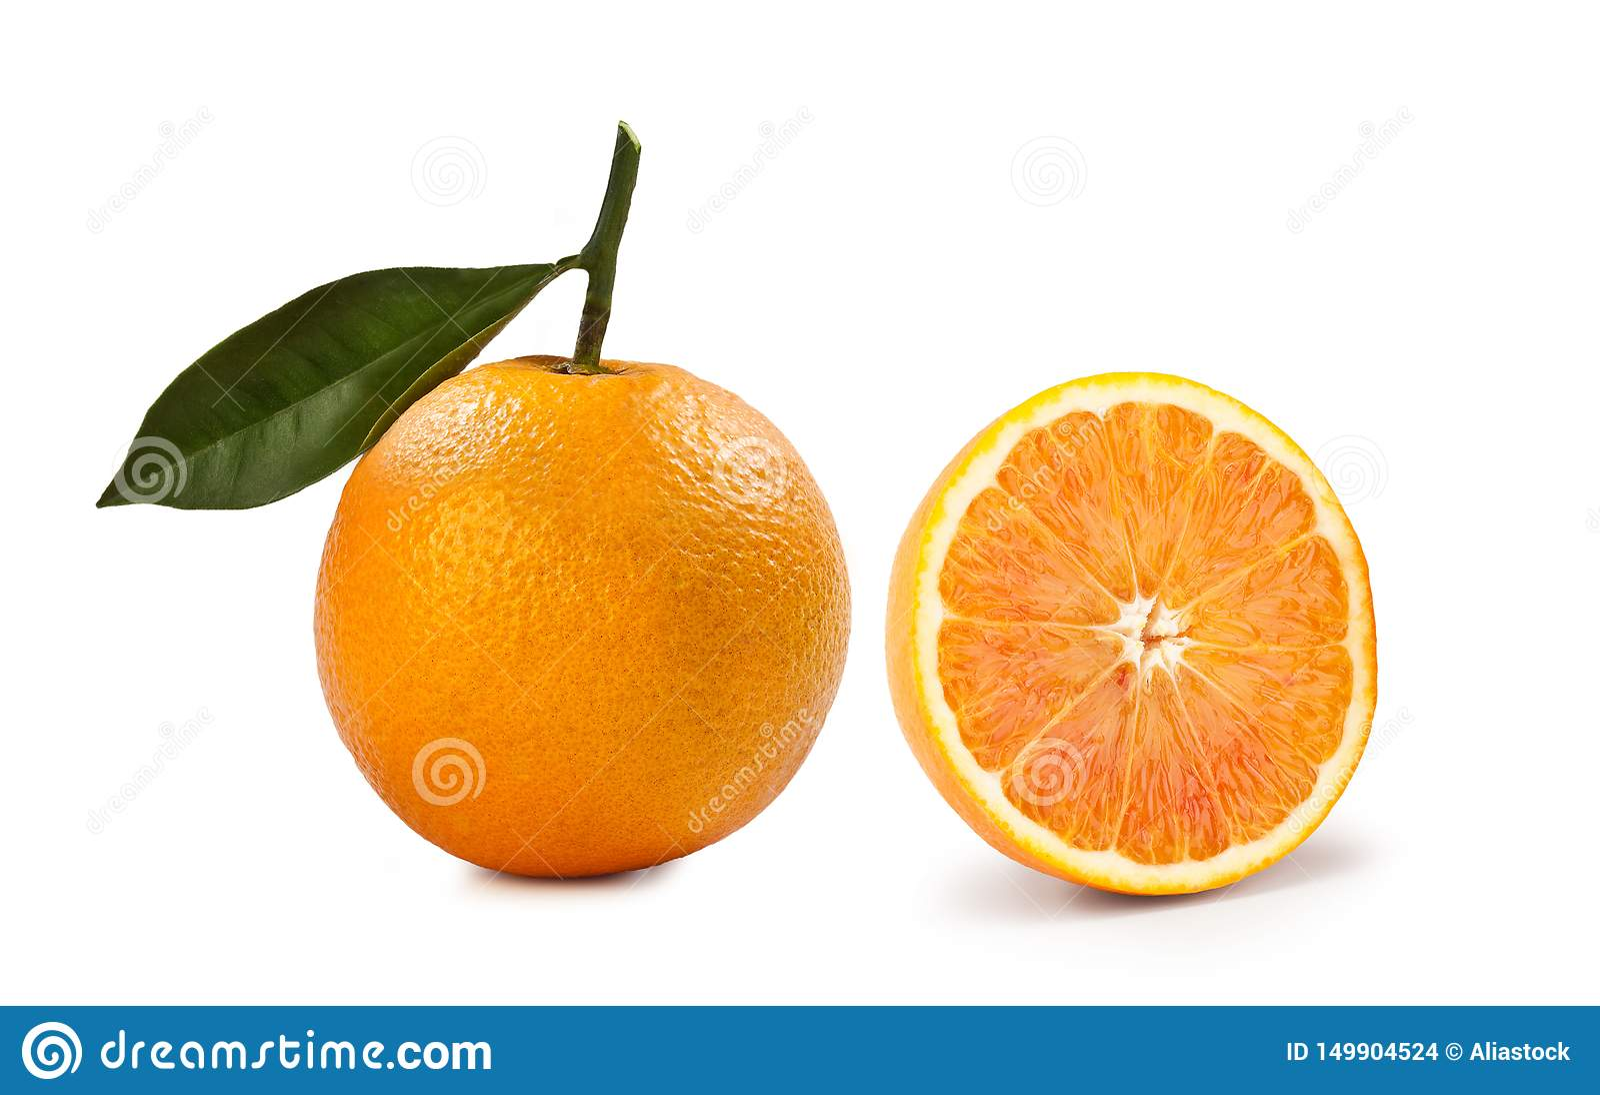 Blond apelsin – 'Arancia Bionda 'på vit bakgrund